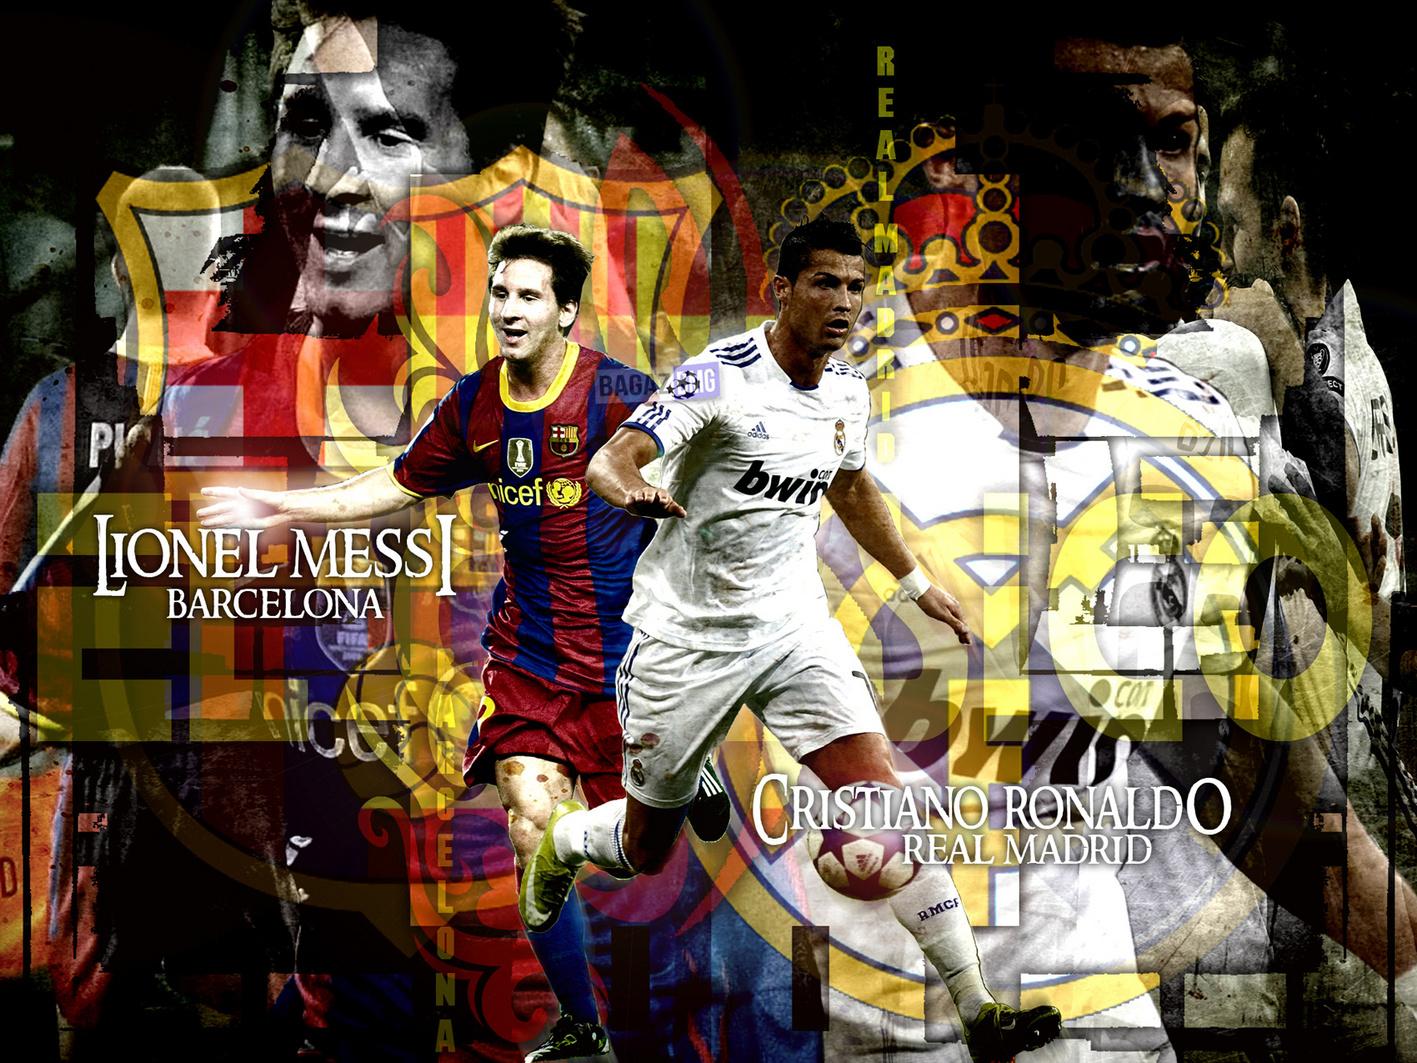 Lionel Messi Vs Cristiano Ronaldo Wallpapers Football News And